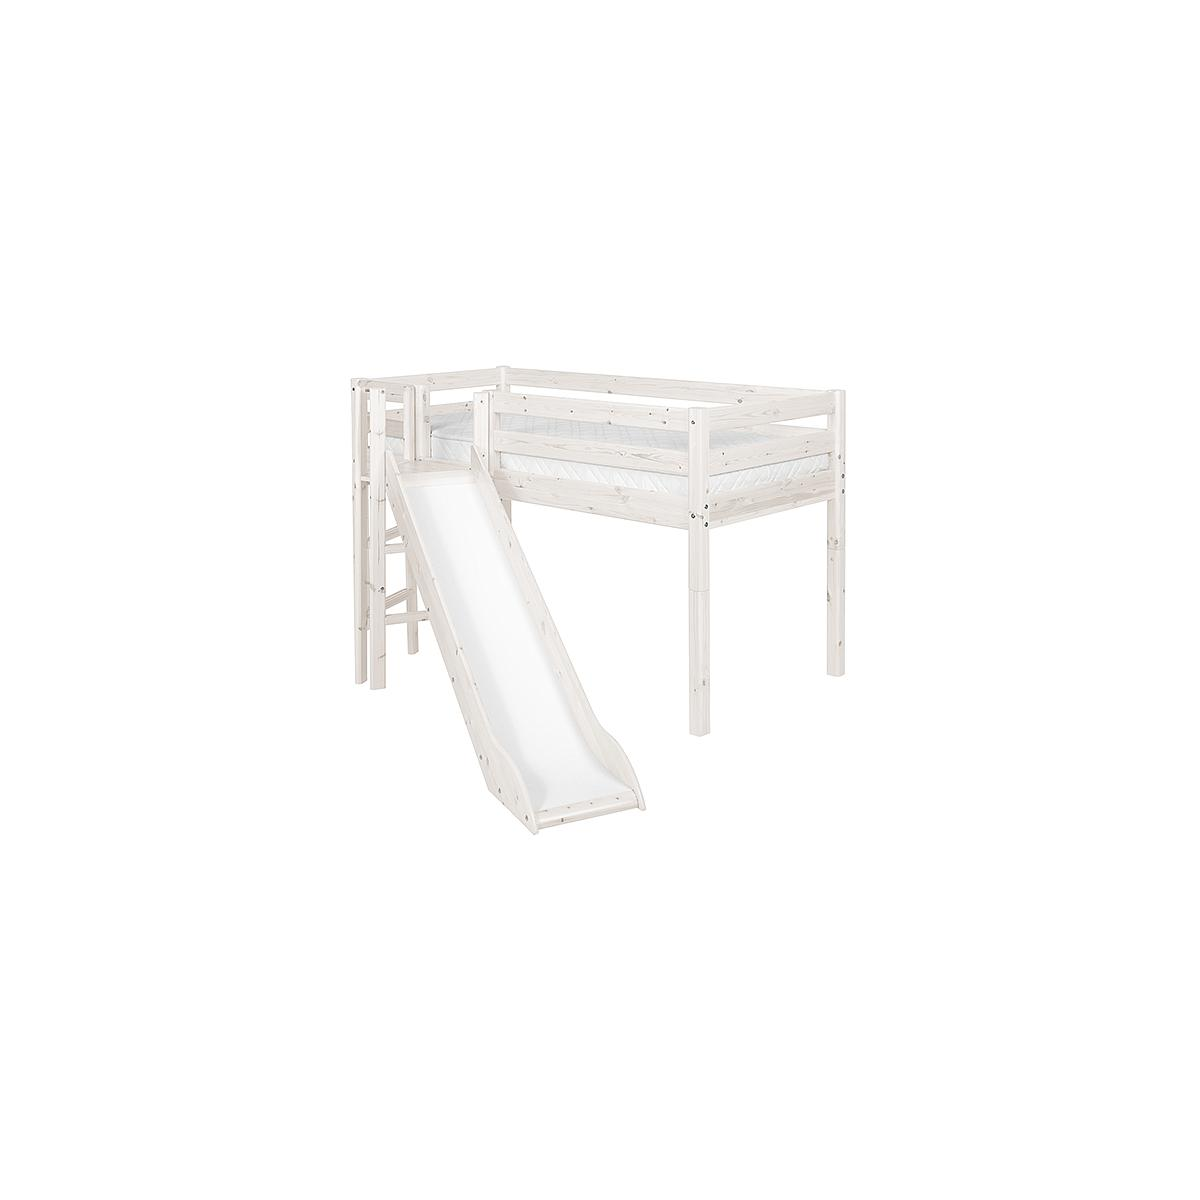 Plataforma y patas Cama media alta CLASSIC Flexa terra